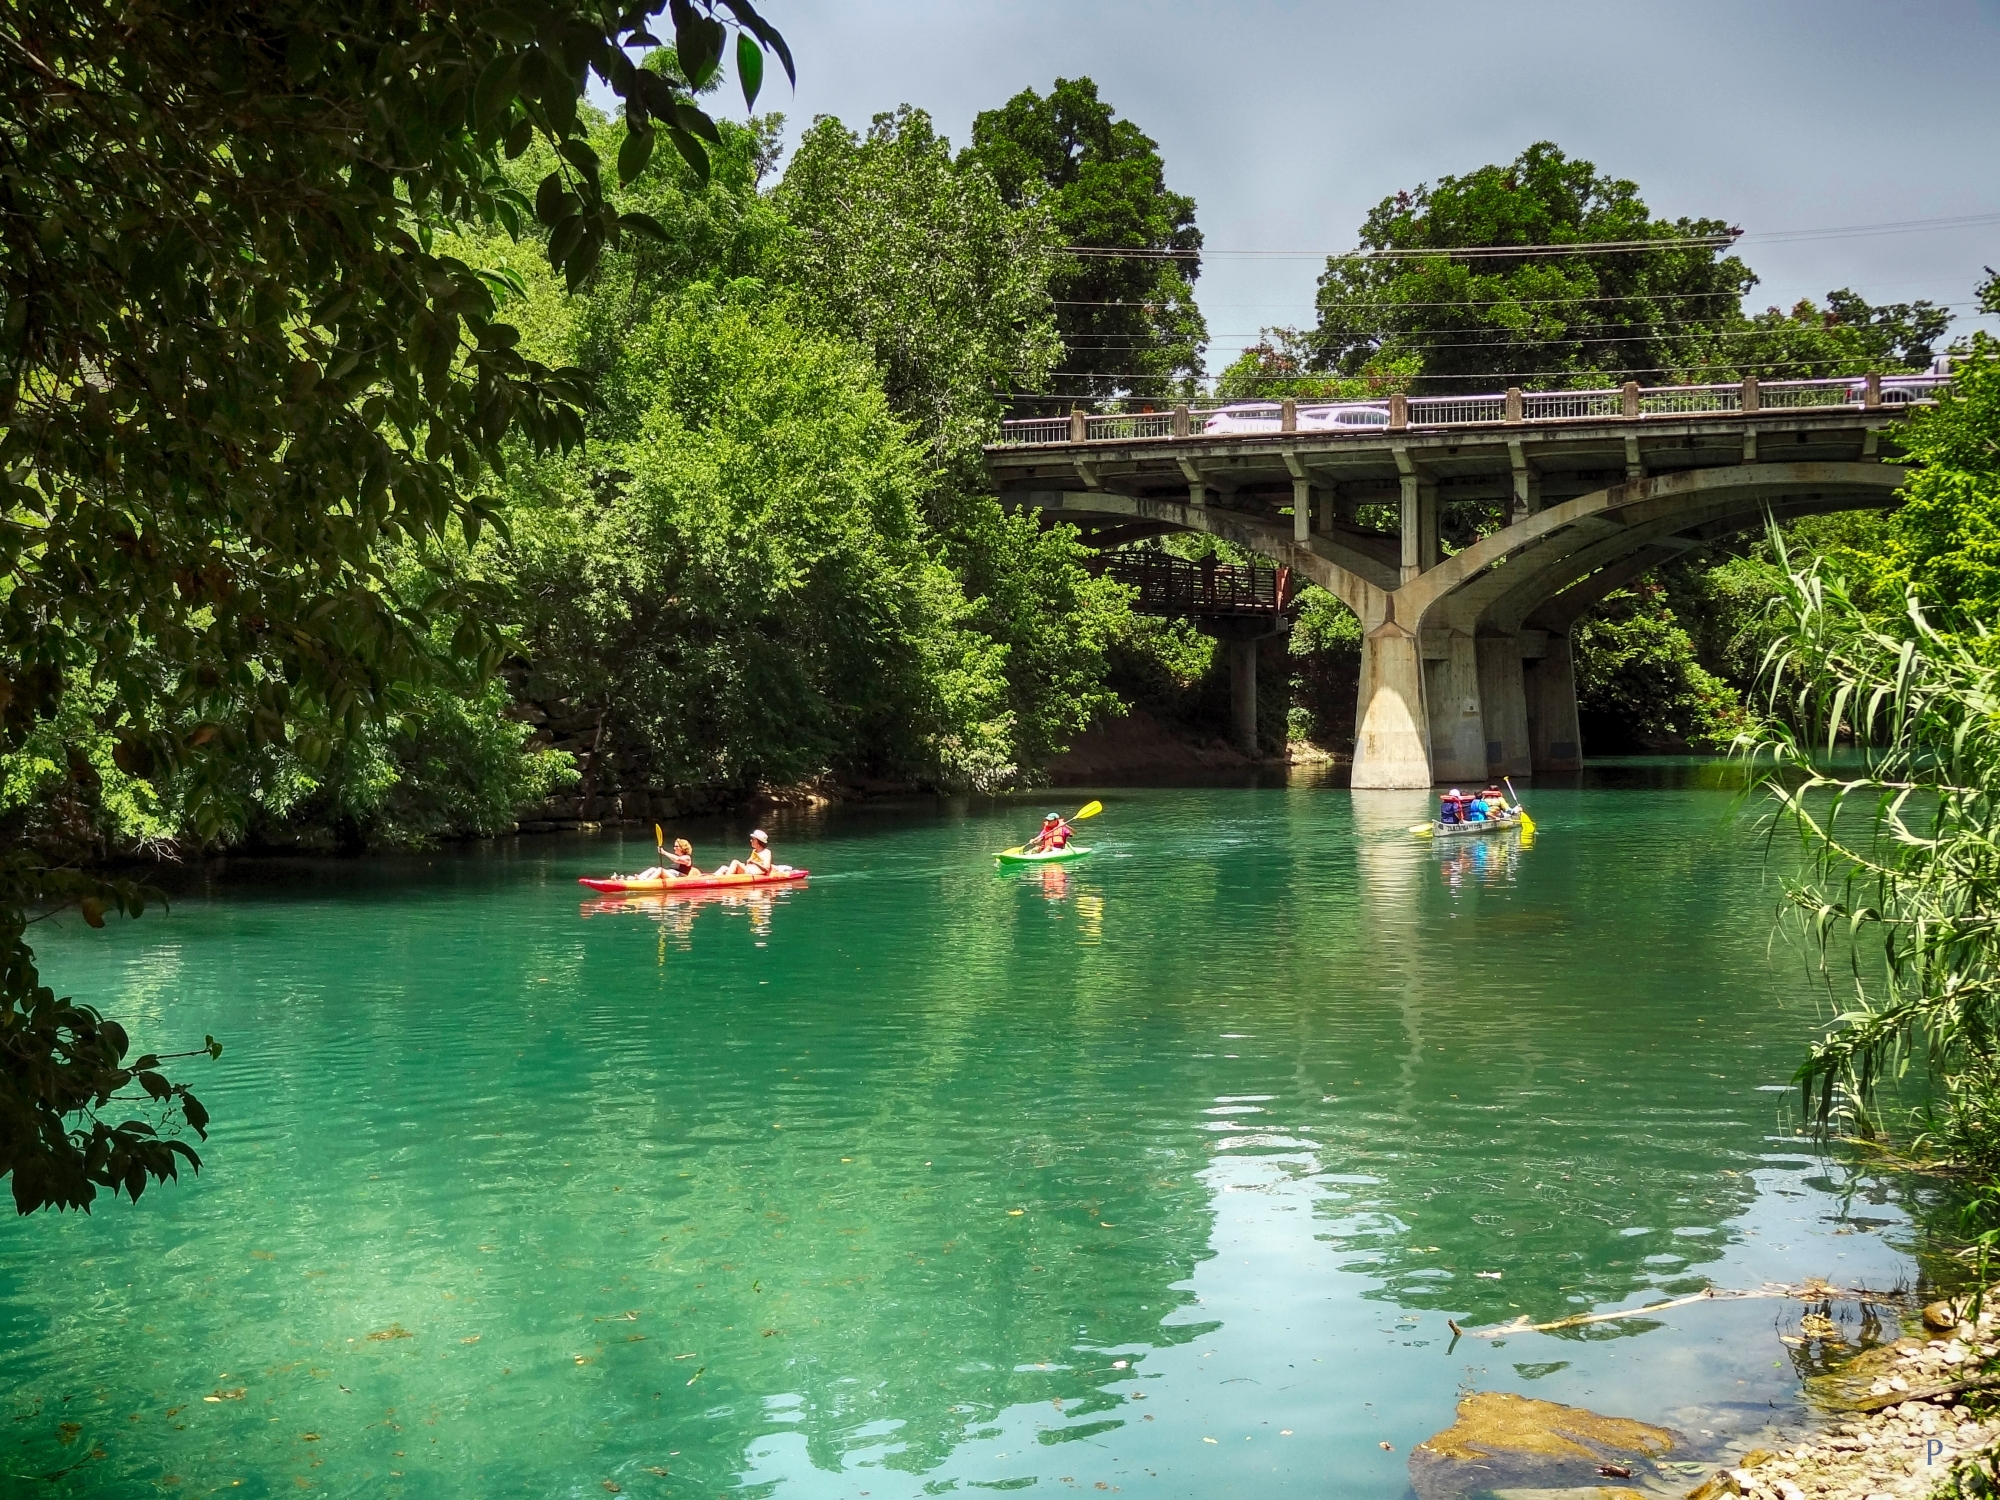 Aug 27, · Book Omni Barton Creek Resort & Spa, Austin on TripAdvisor: See 2, traveler reviews, candid photos, and great deals for Omni Barton Creek Resort & Spa, ranked #96 of hotels in Austin and rated 4 of 5 at TripAdvisor.4/4(K).